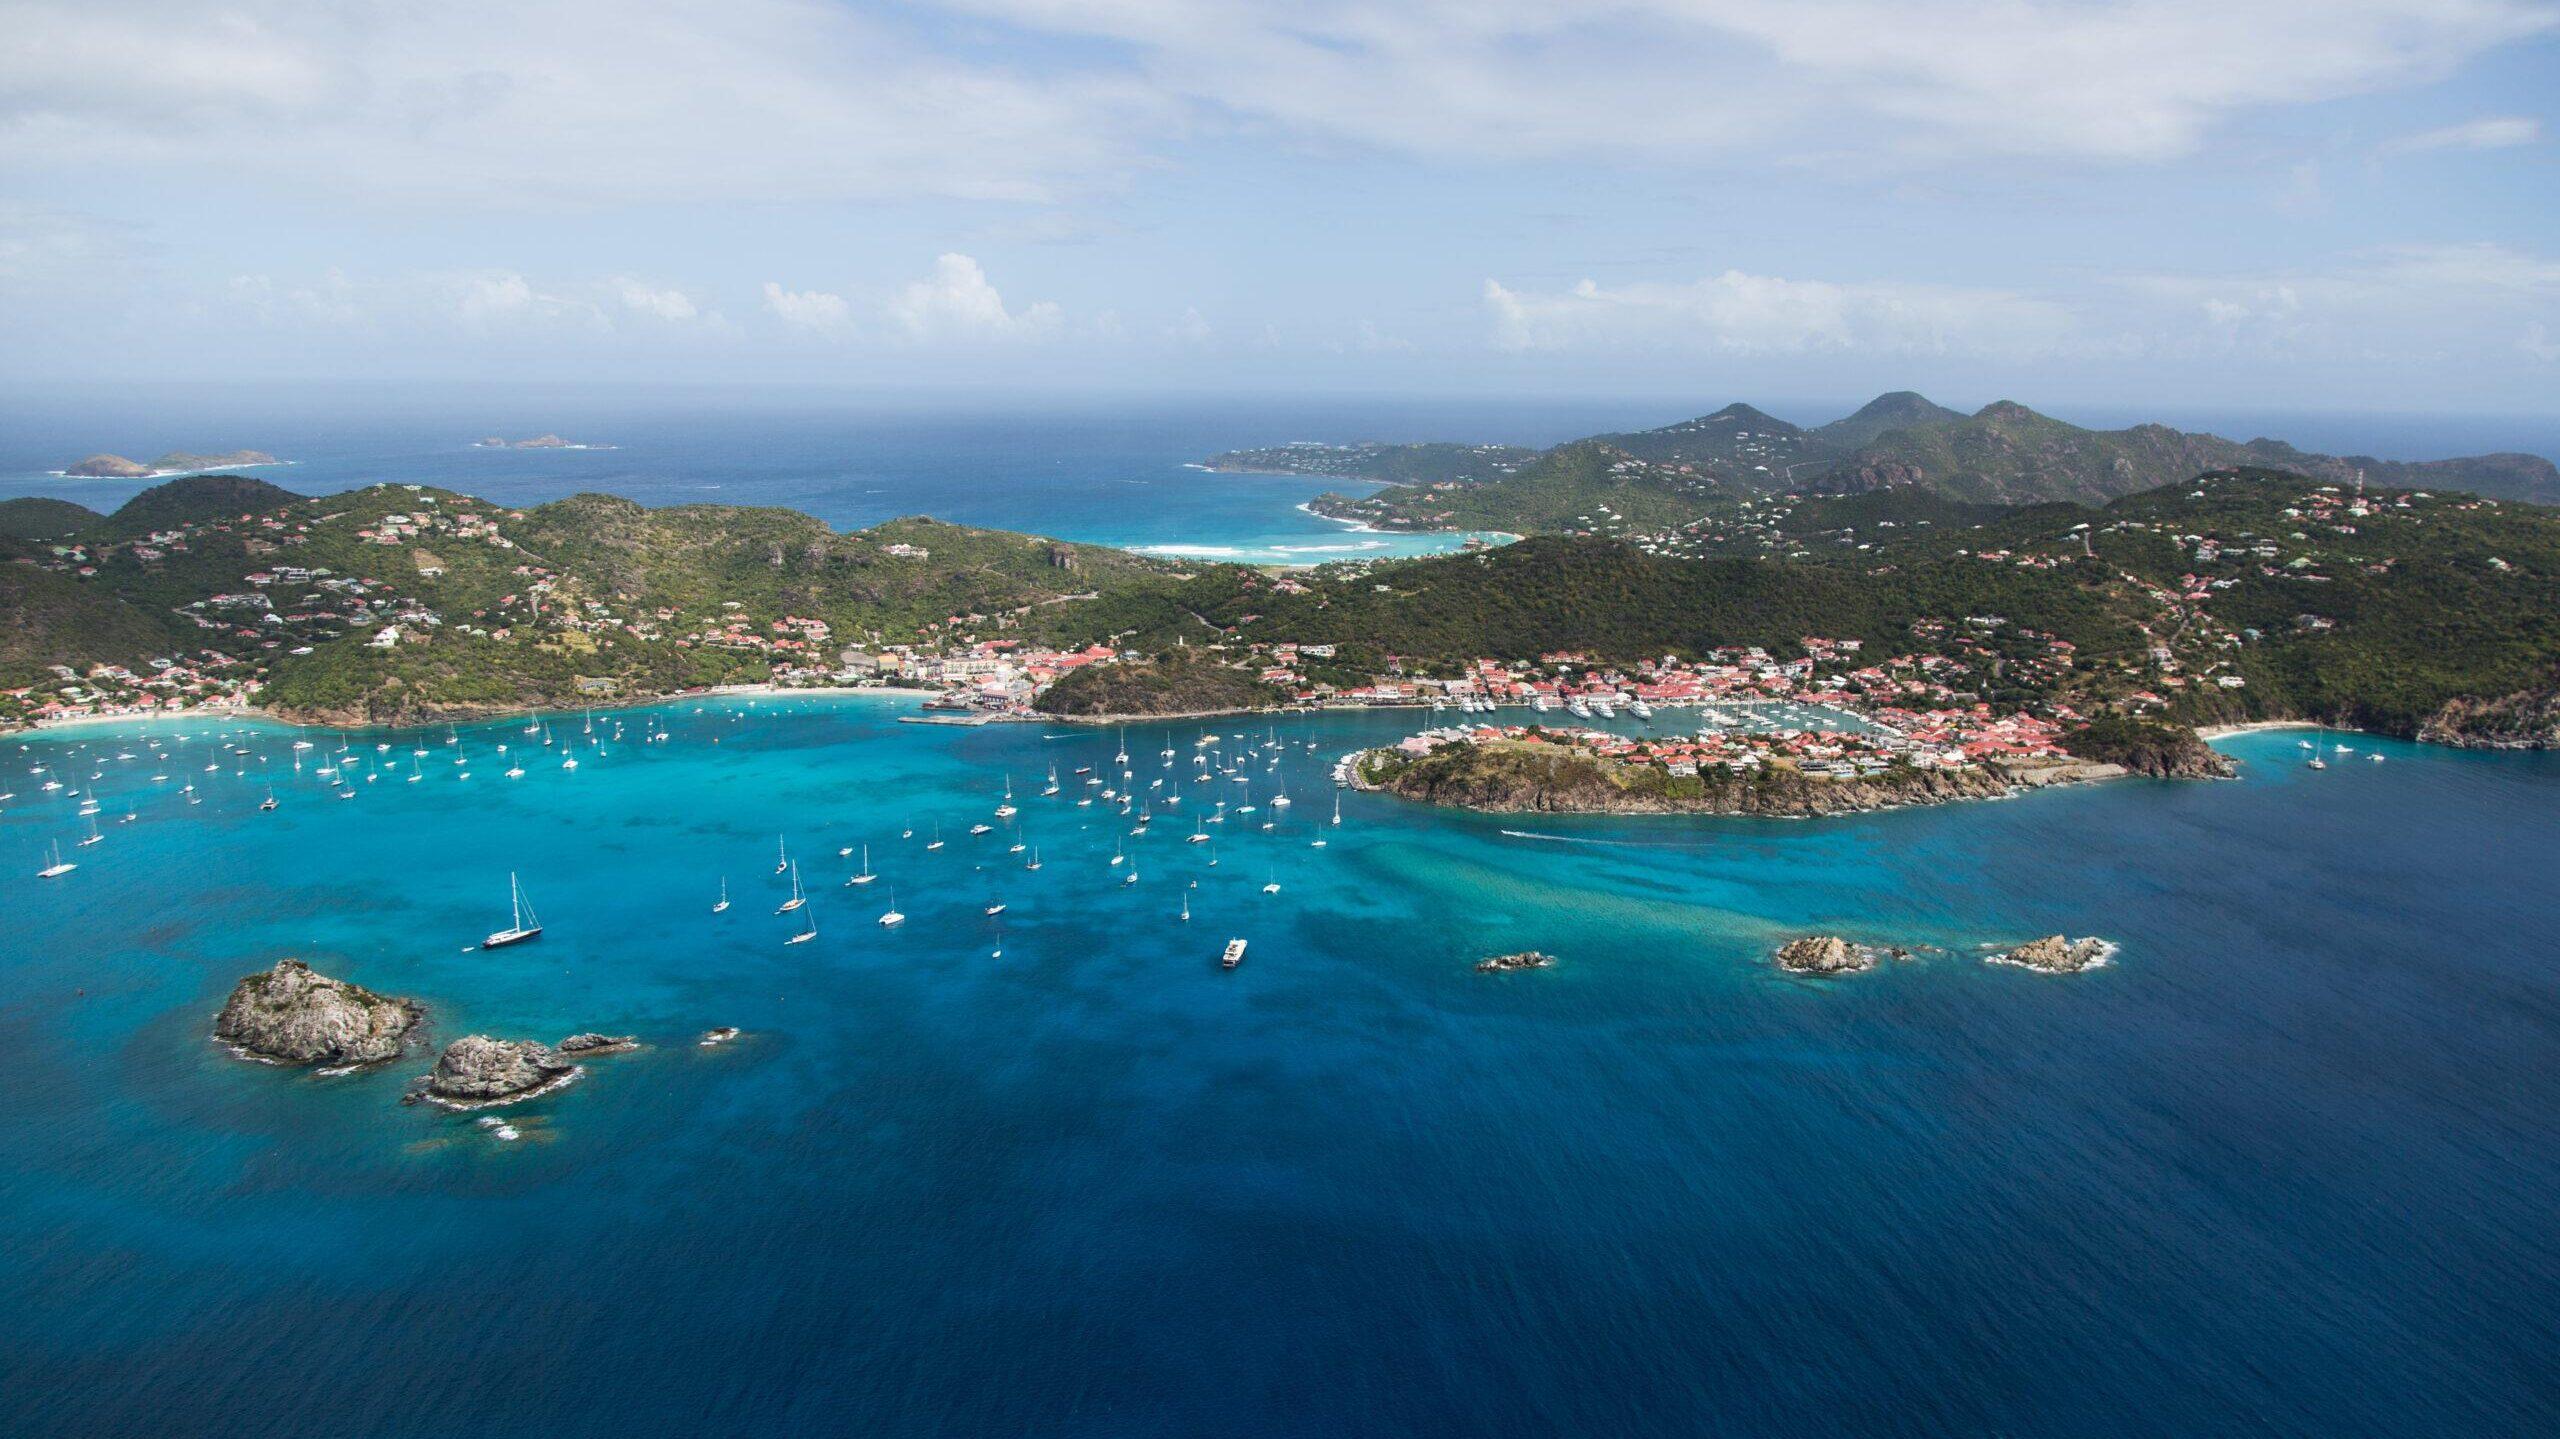 St Barts Luxury Caribbean Island